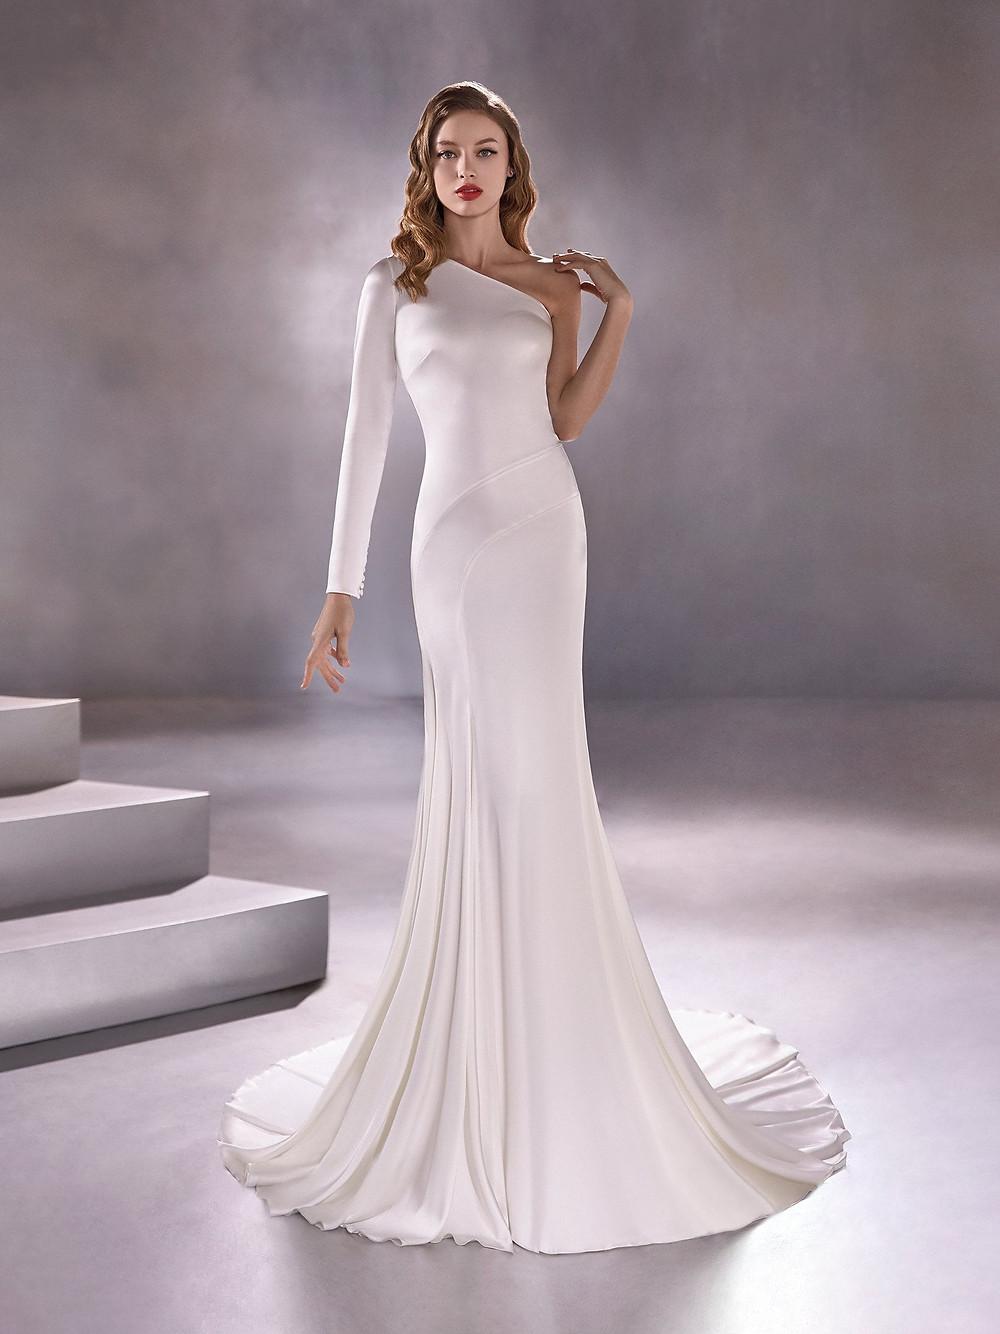 A Pronovias clean long sleeve, one shoulder sheath wedding dress